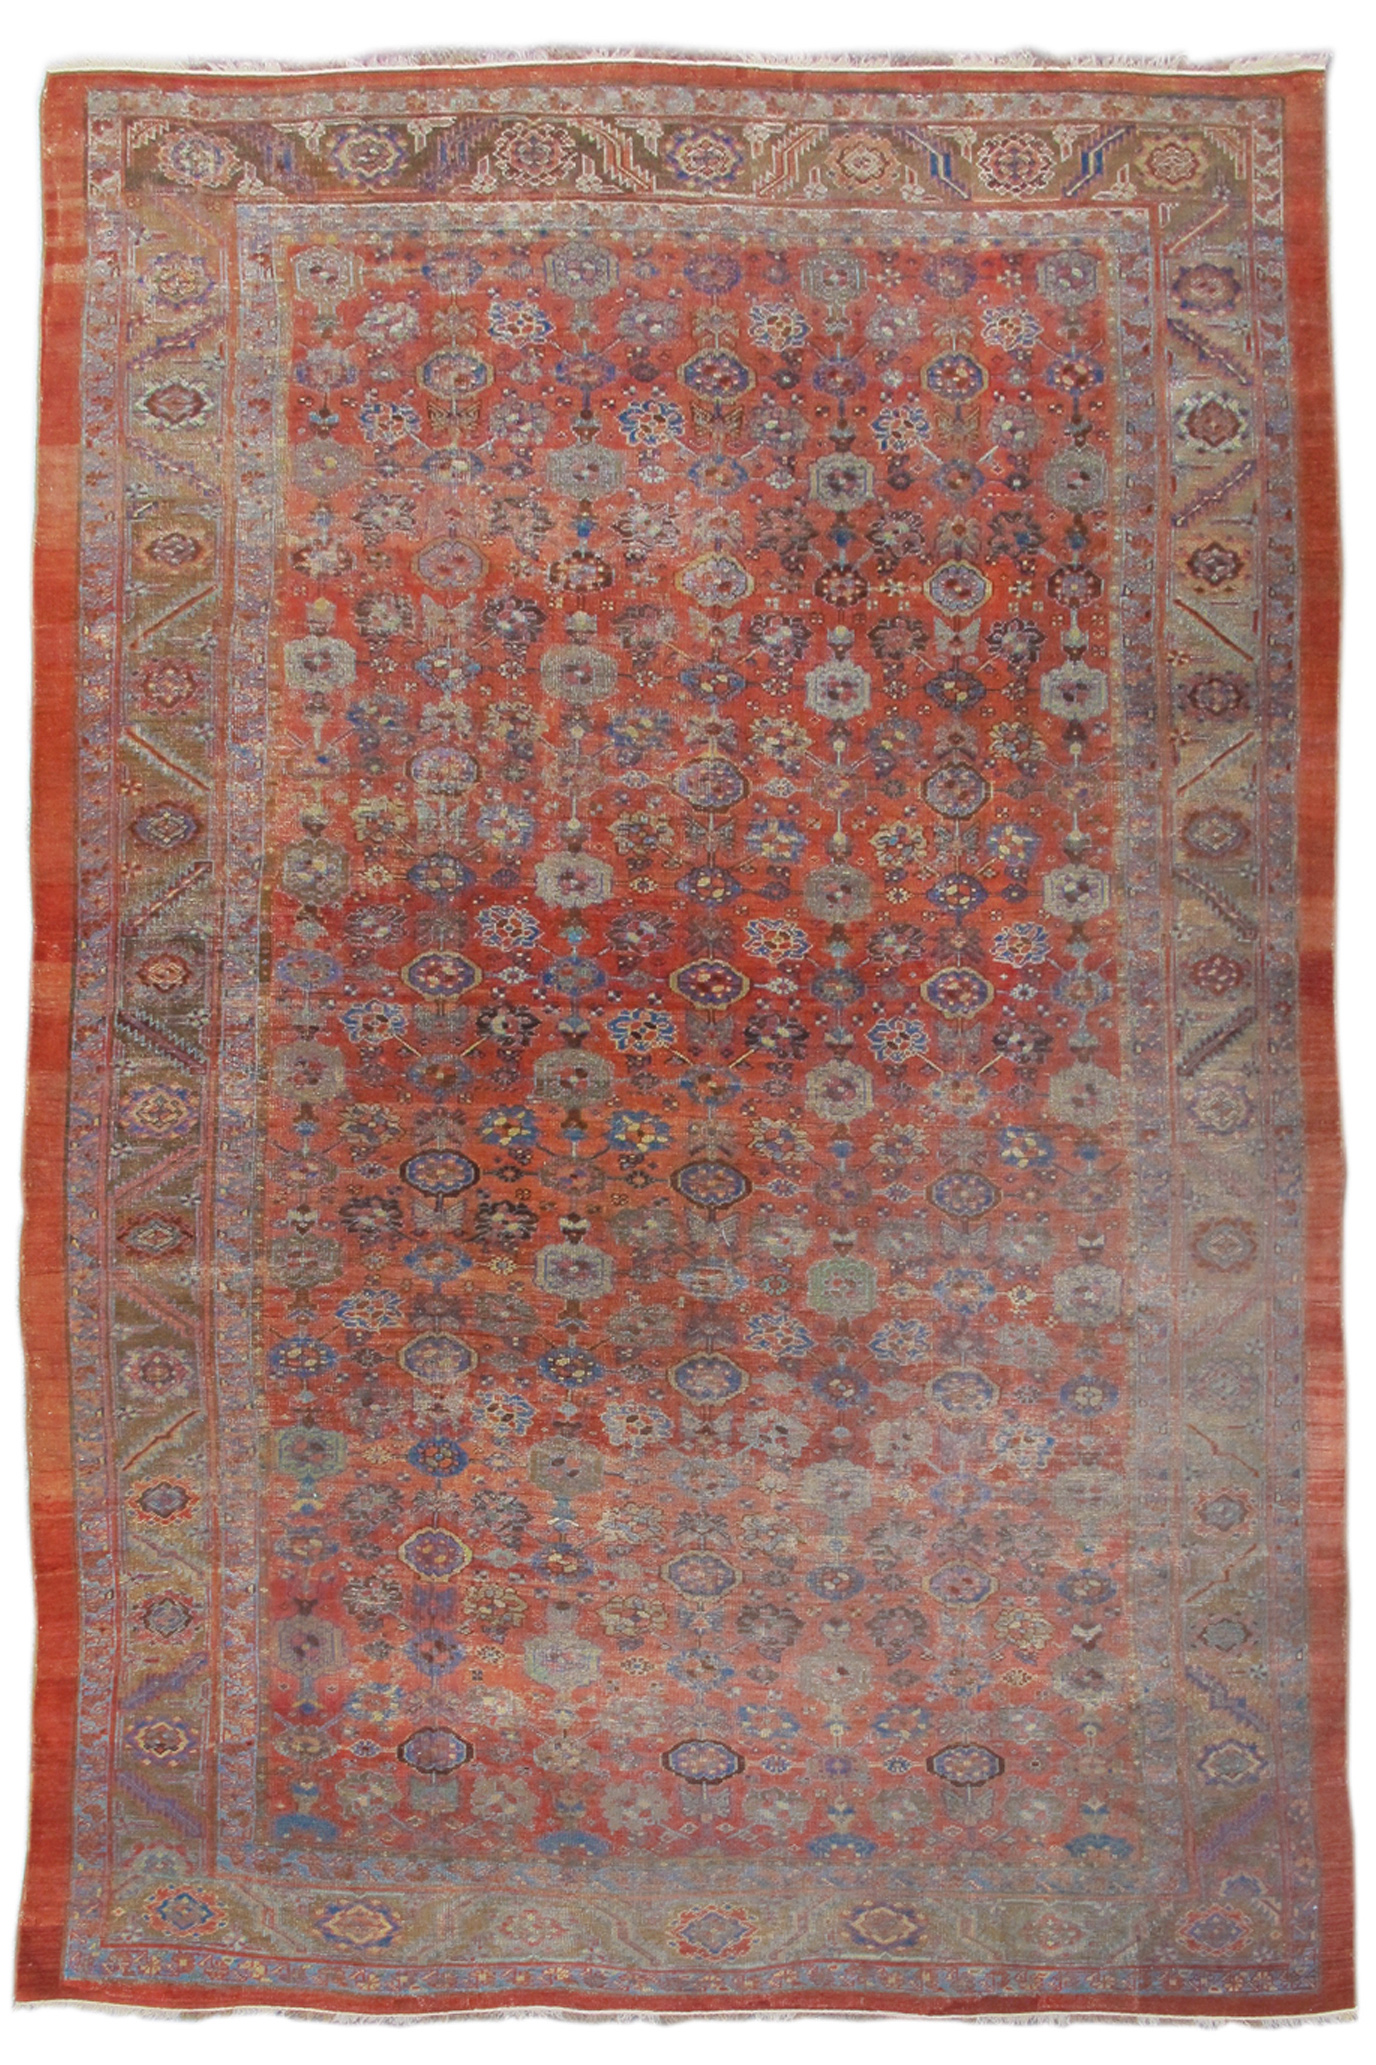 Bakhshaish rug